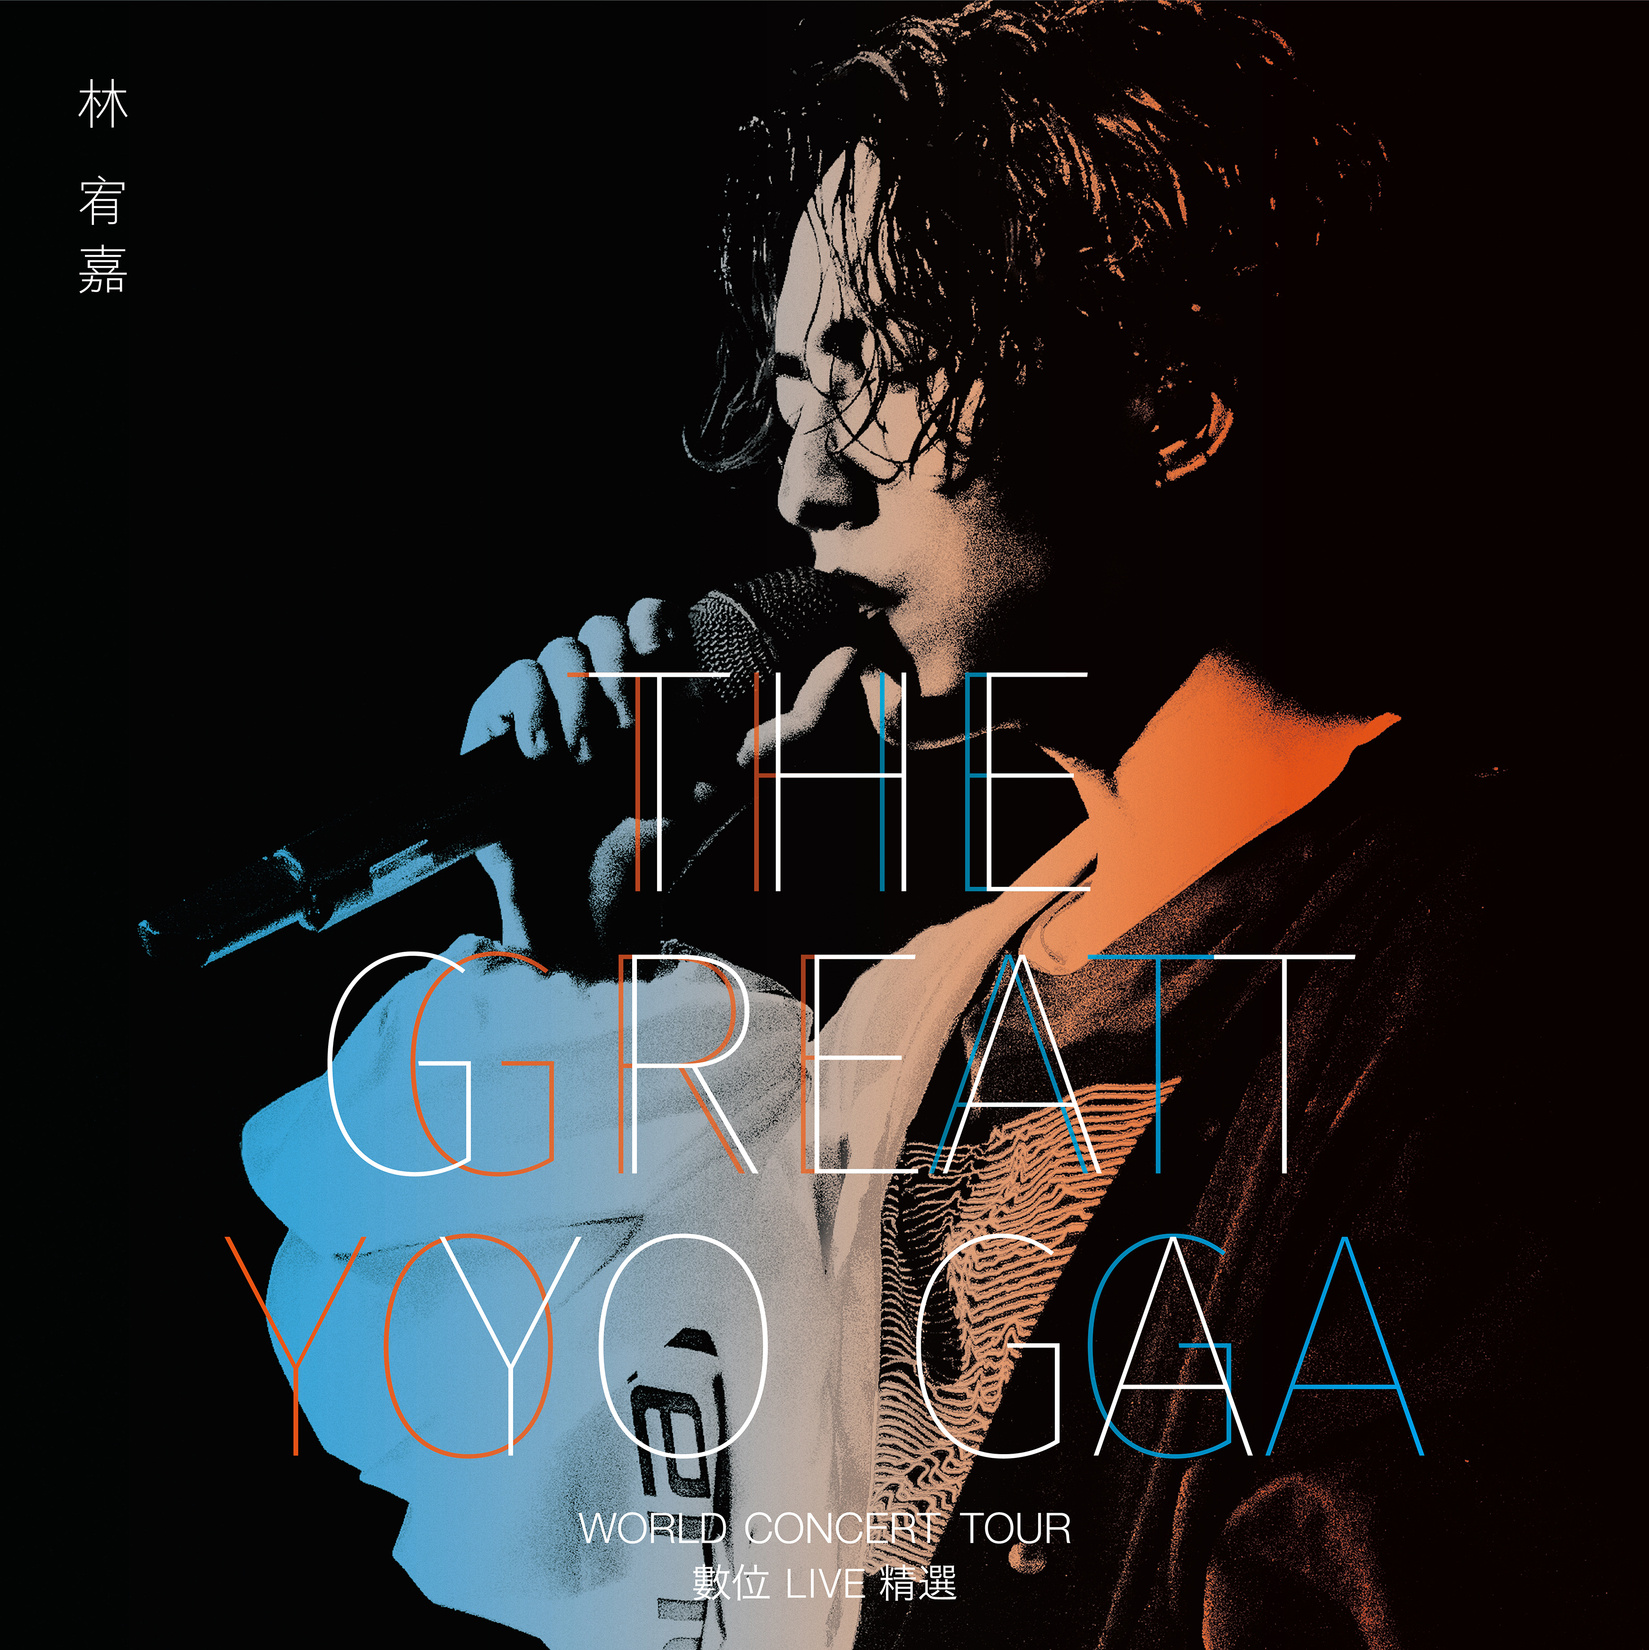 林宥嘉 The GREAT YOGA 演唱会数位Live精选